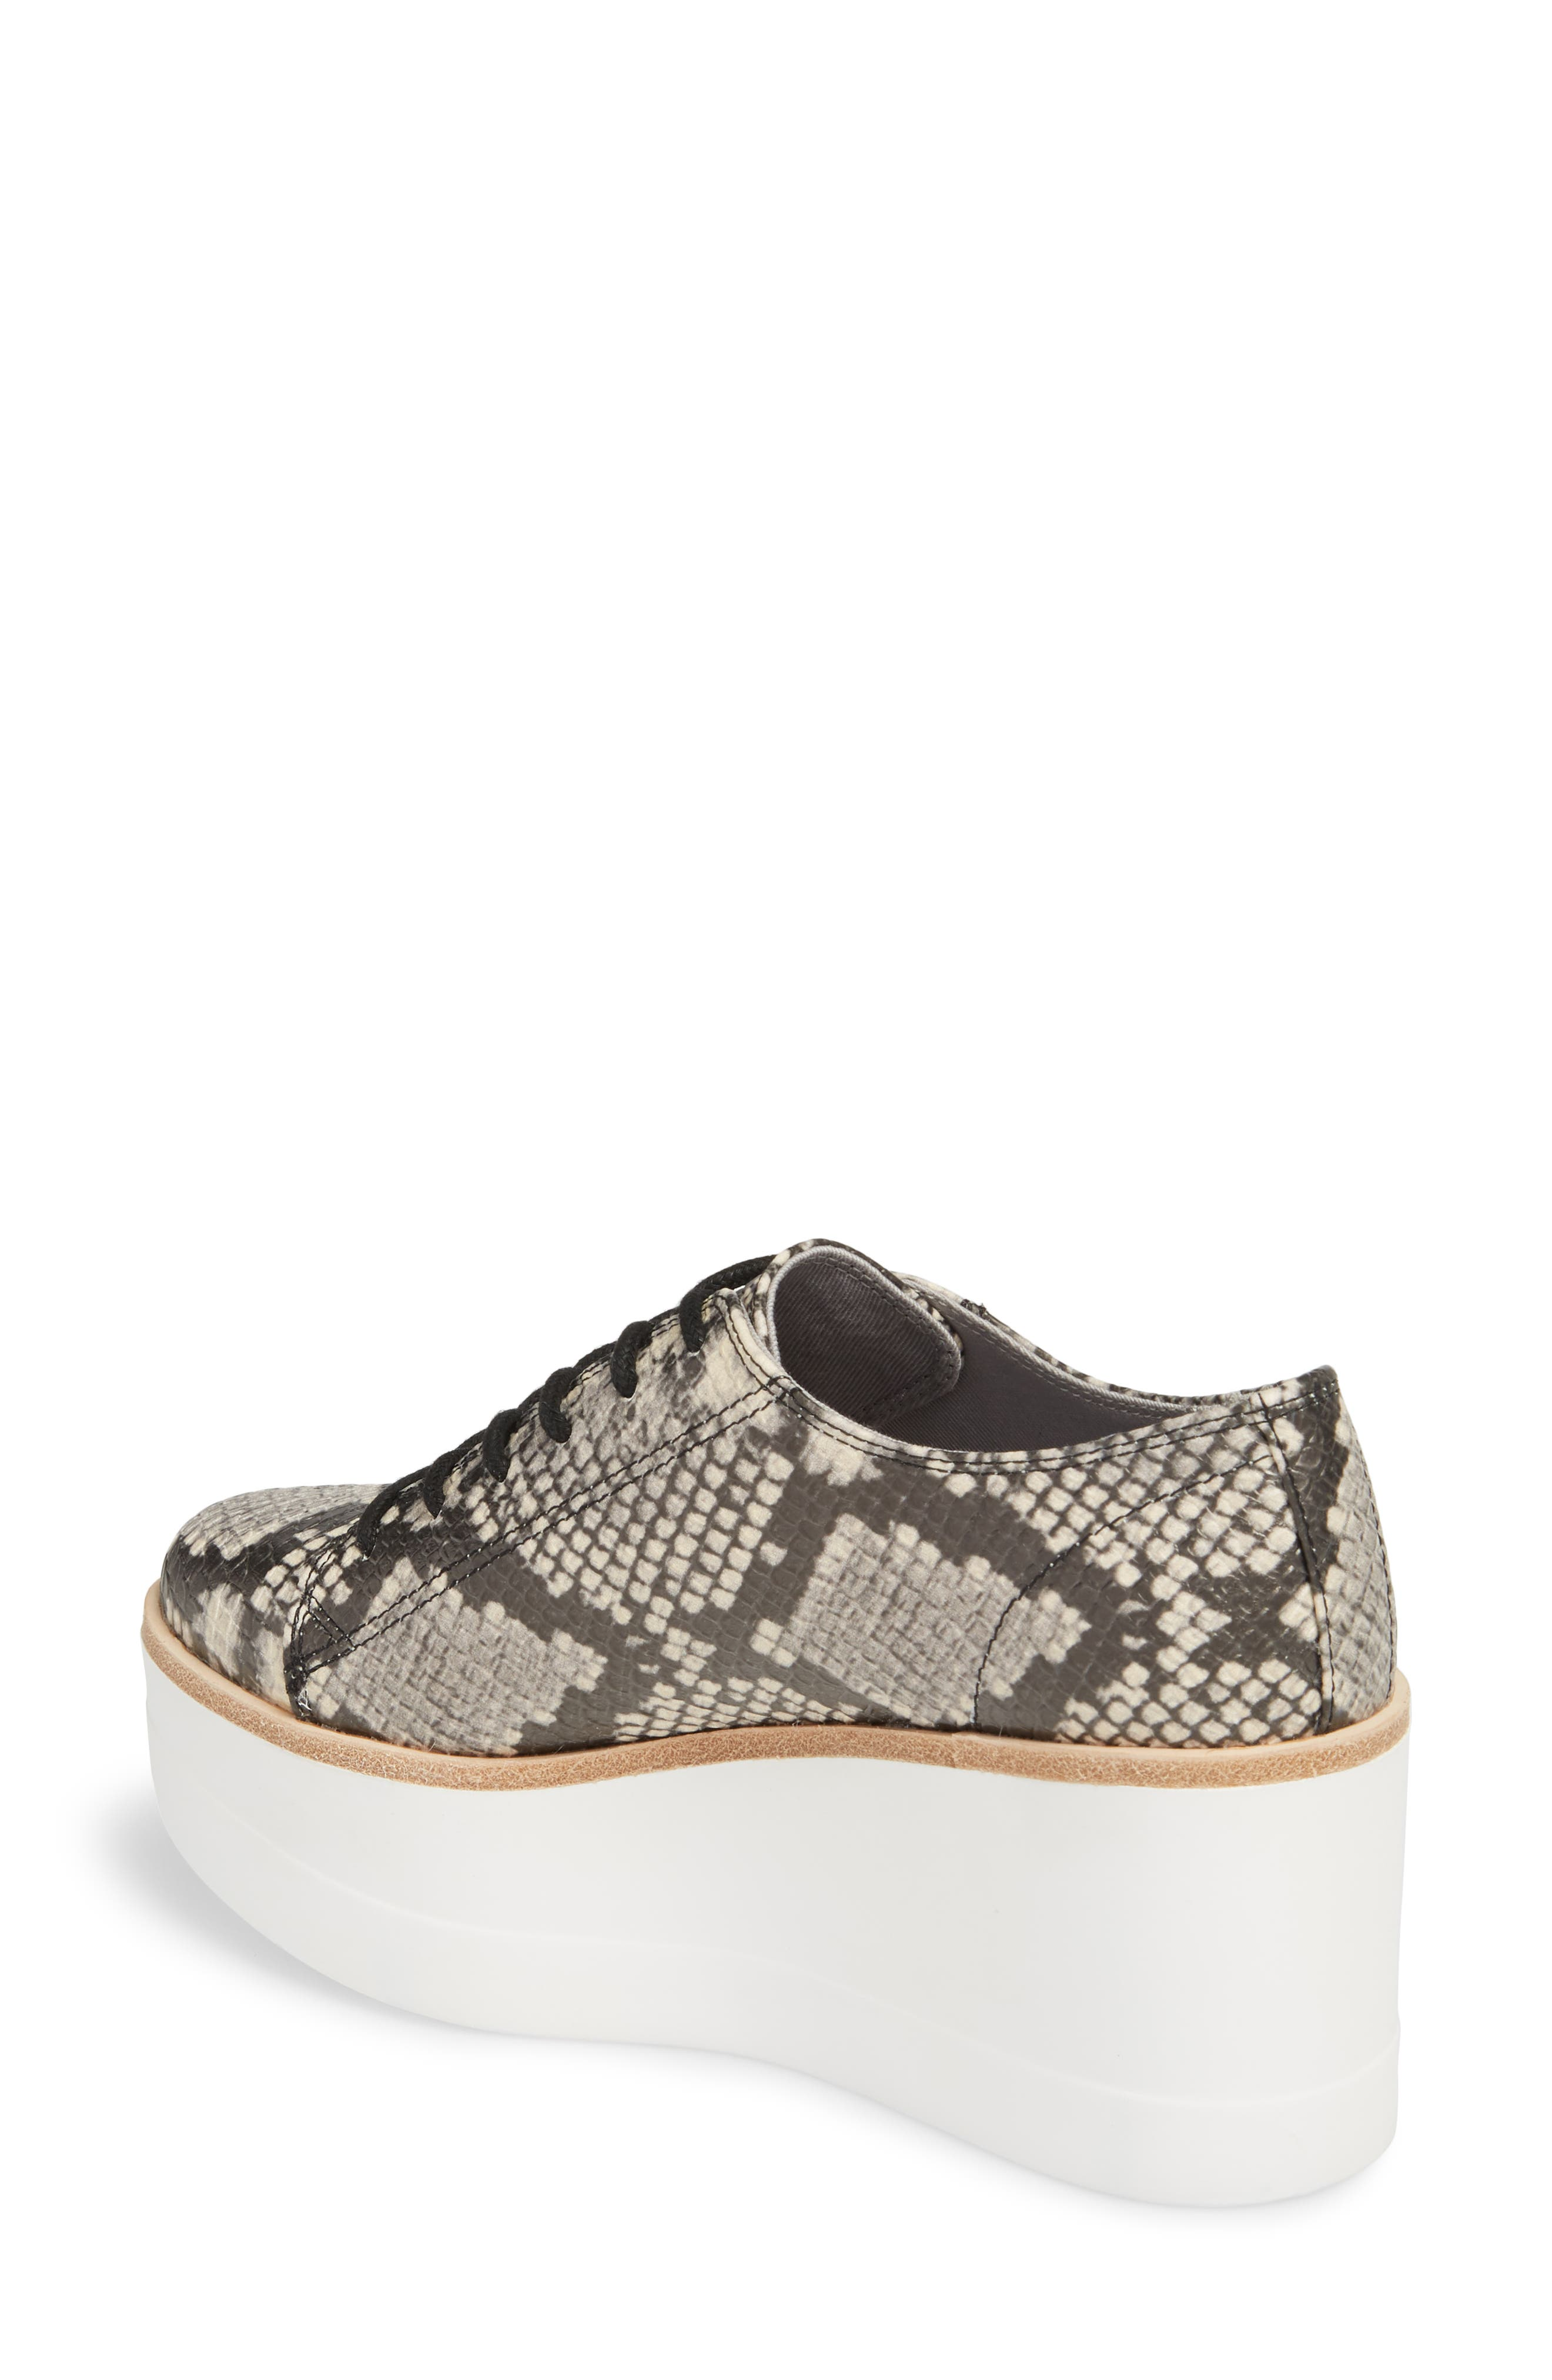 Kimber Wedge Platform Sneaker,                             Alternate thumbnail 2, color,                             Natural Snake Print